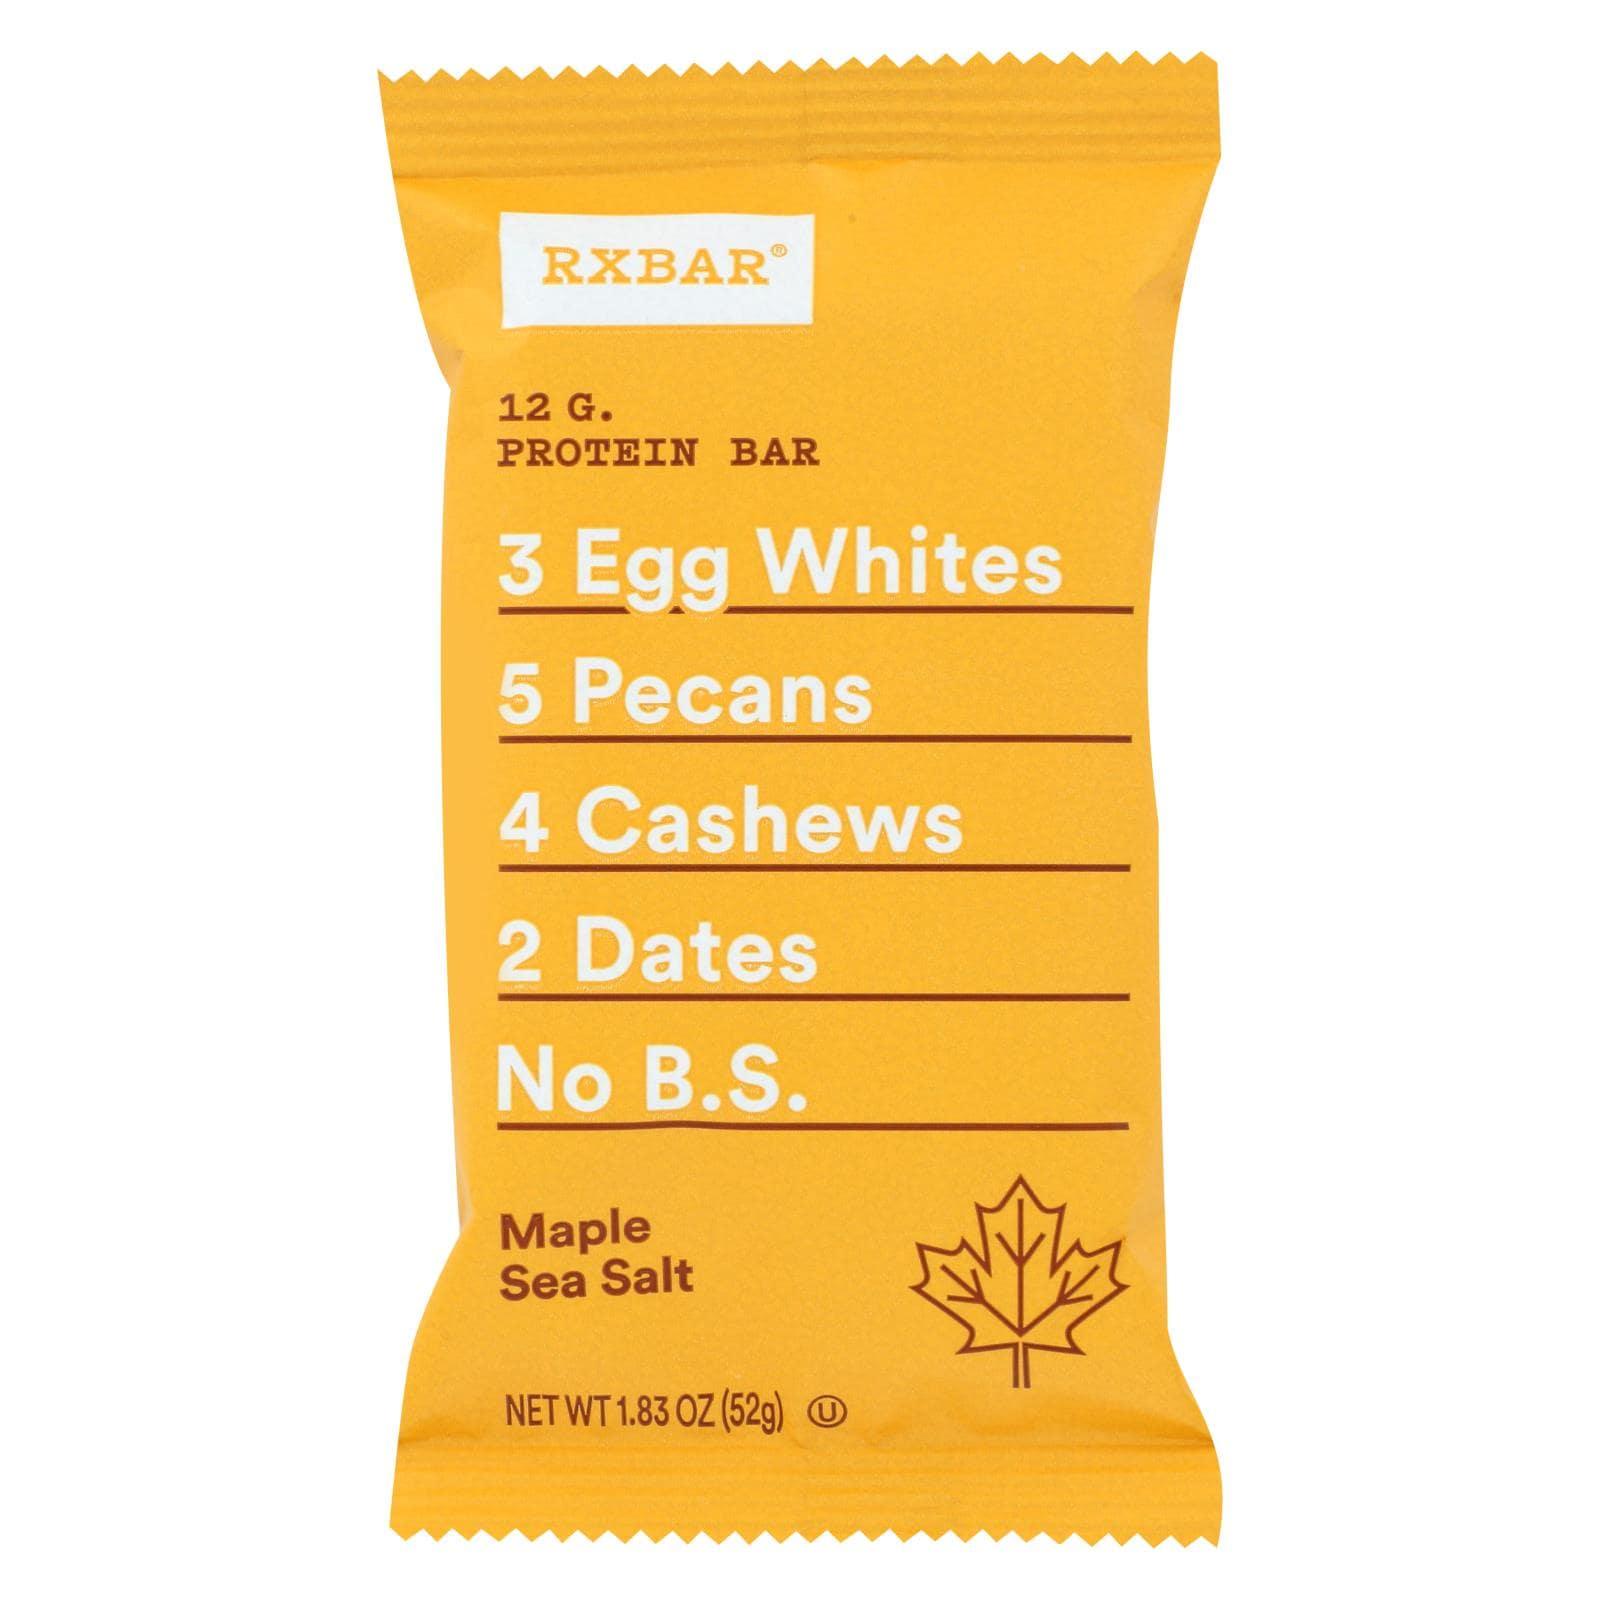 Rx Bar Protein Bar - Maple Sea Salt